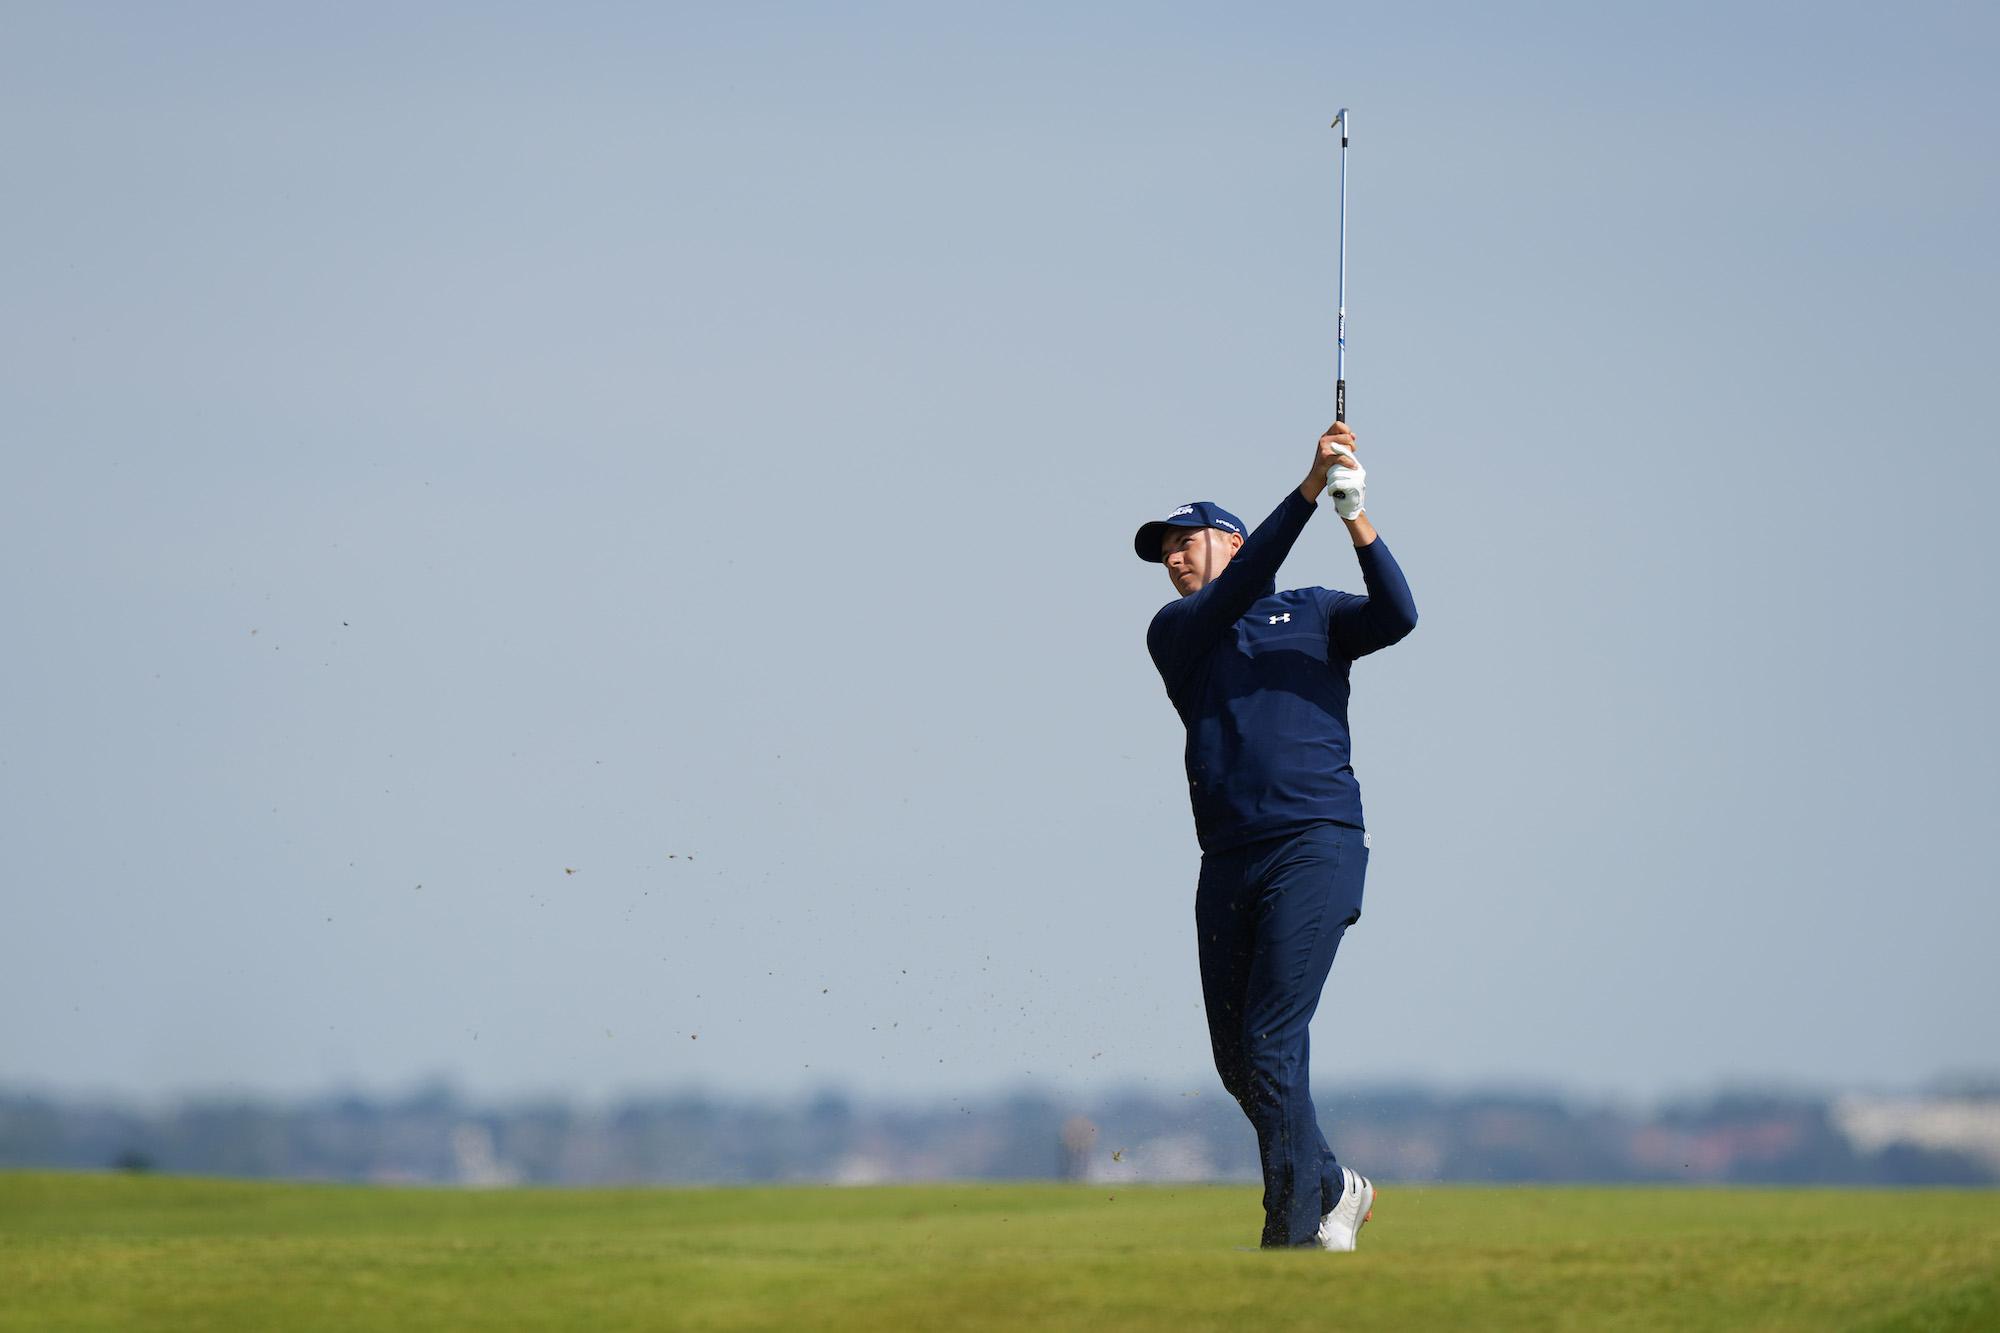 2021 Open Championship: Round 1 - Jordan Plays His Shot on No. 8